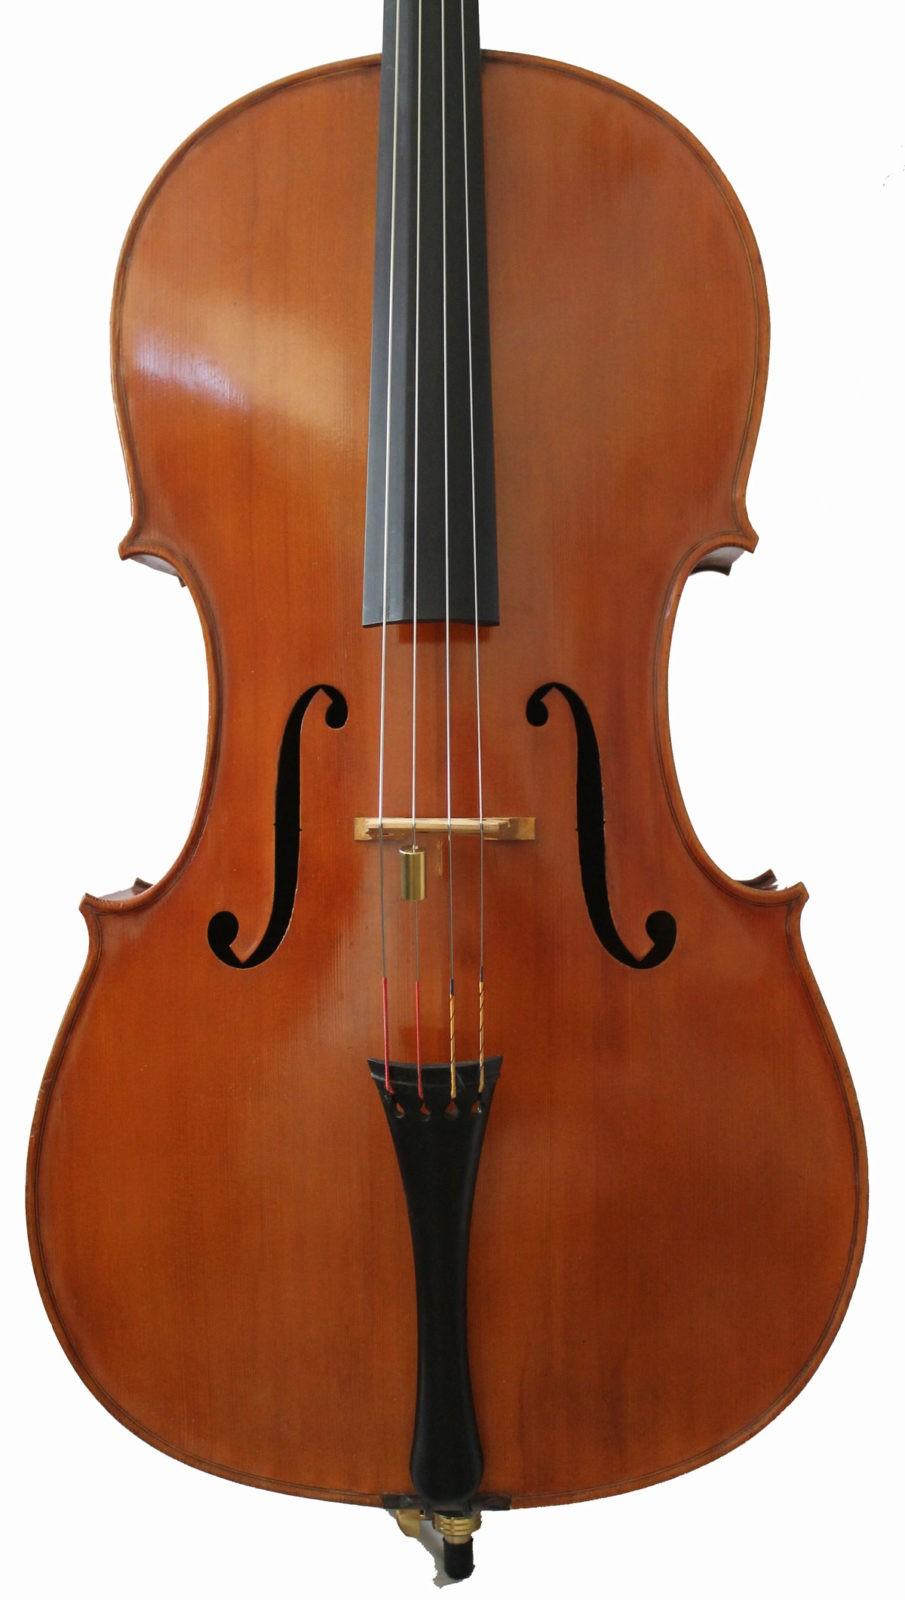 Enzon Bertelli cello